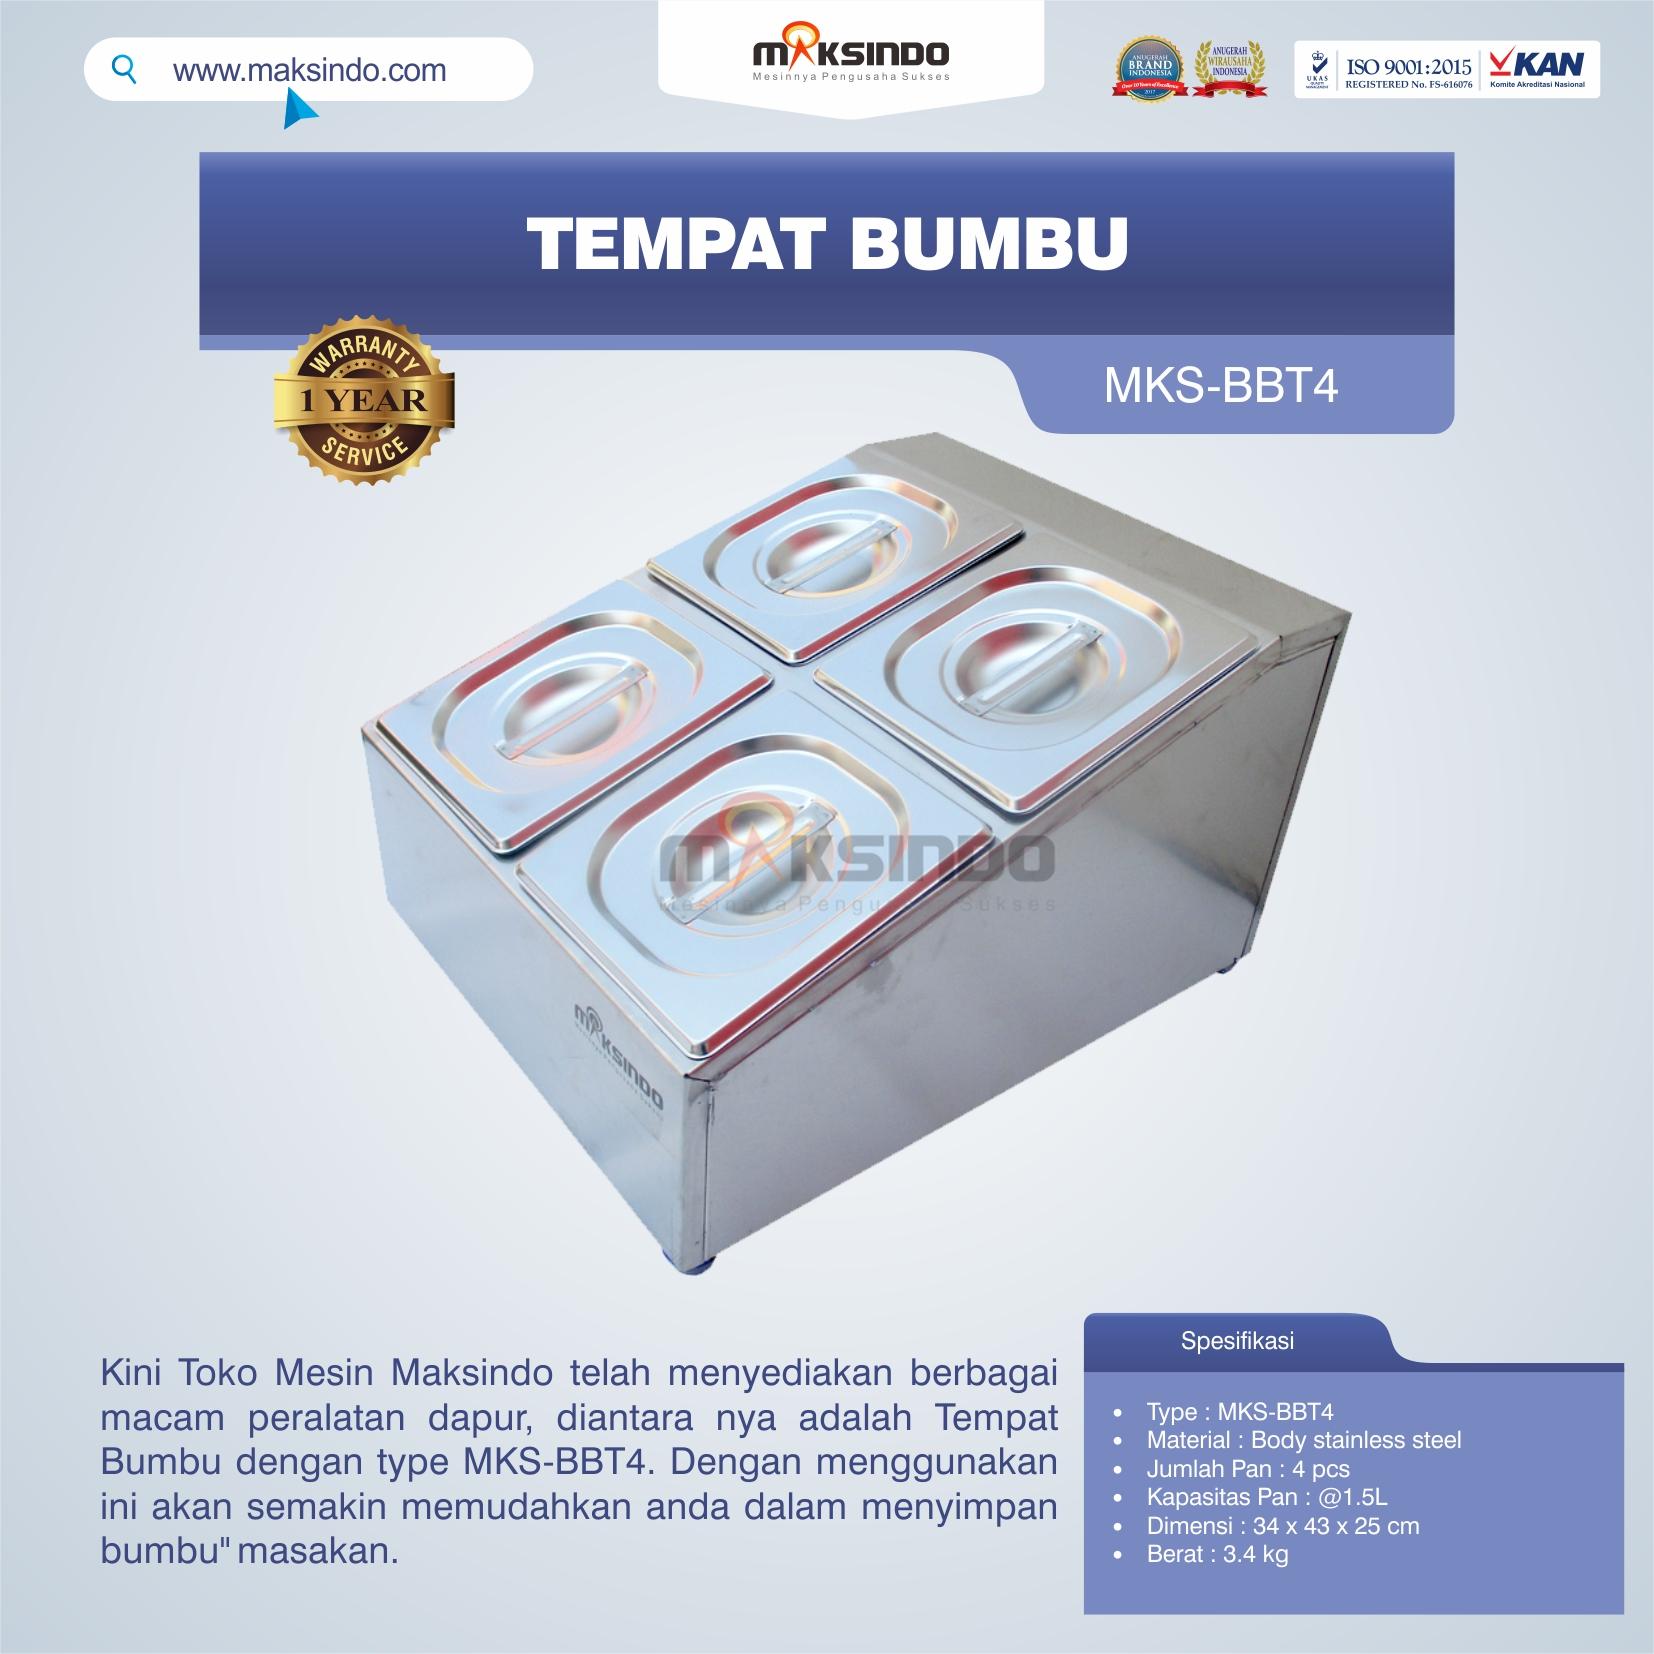 Jual Tempat Bumbu MKS-BBT4 di Palembang